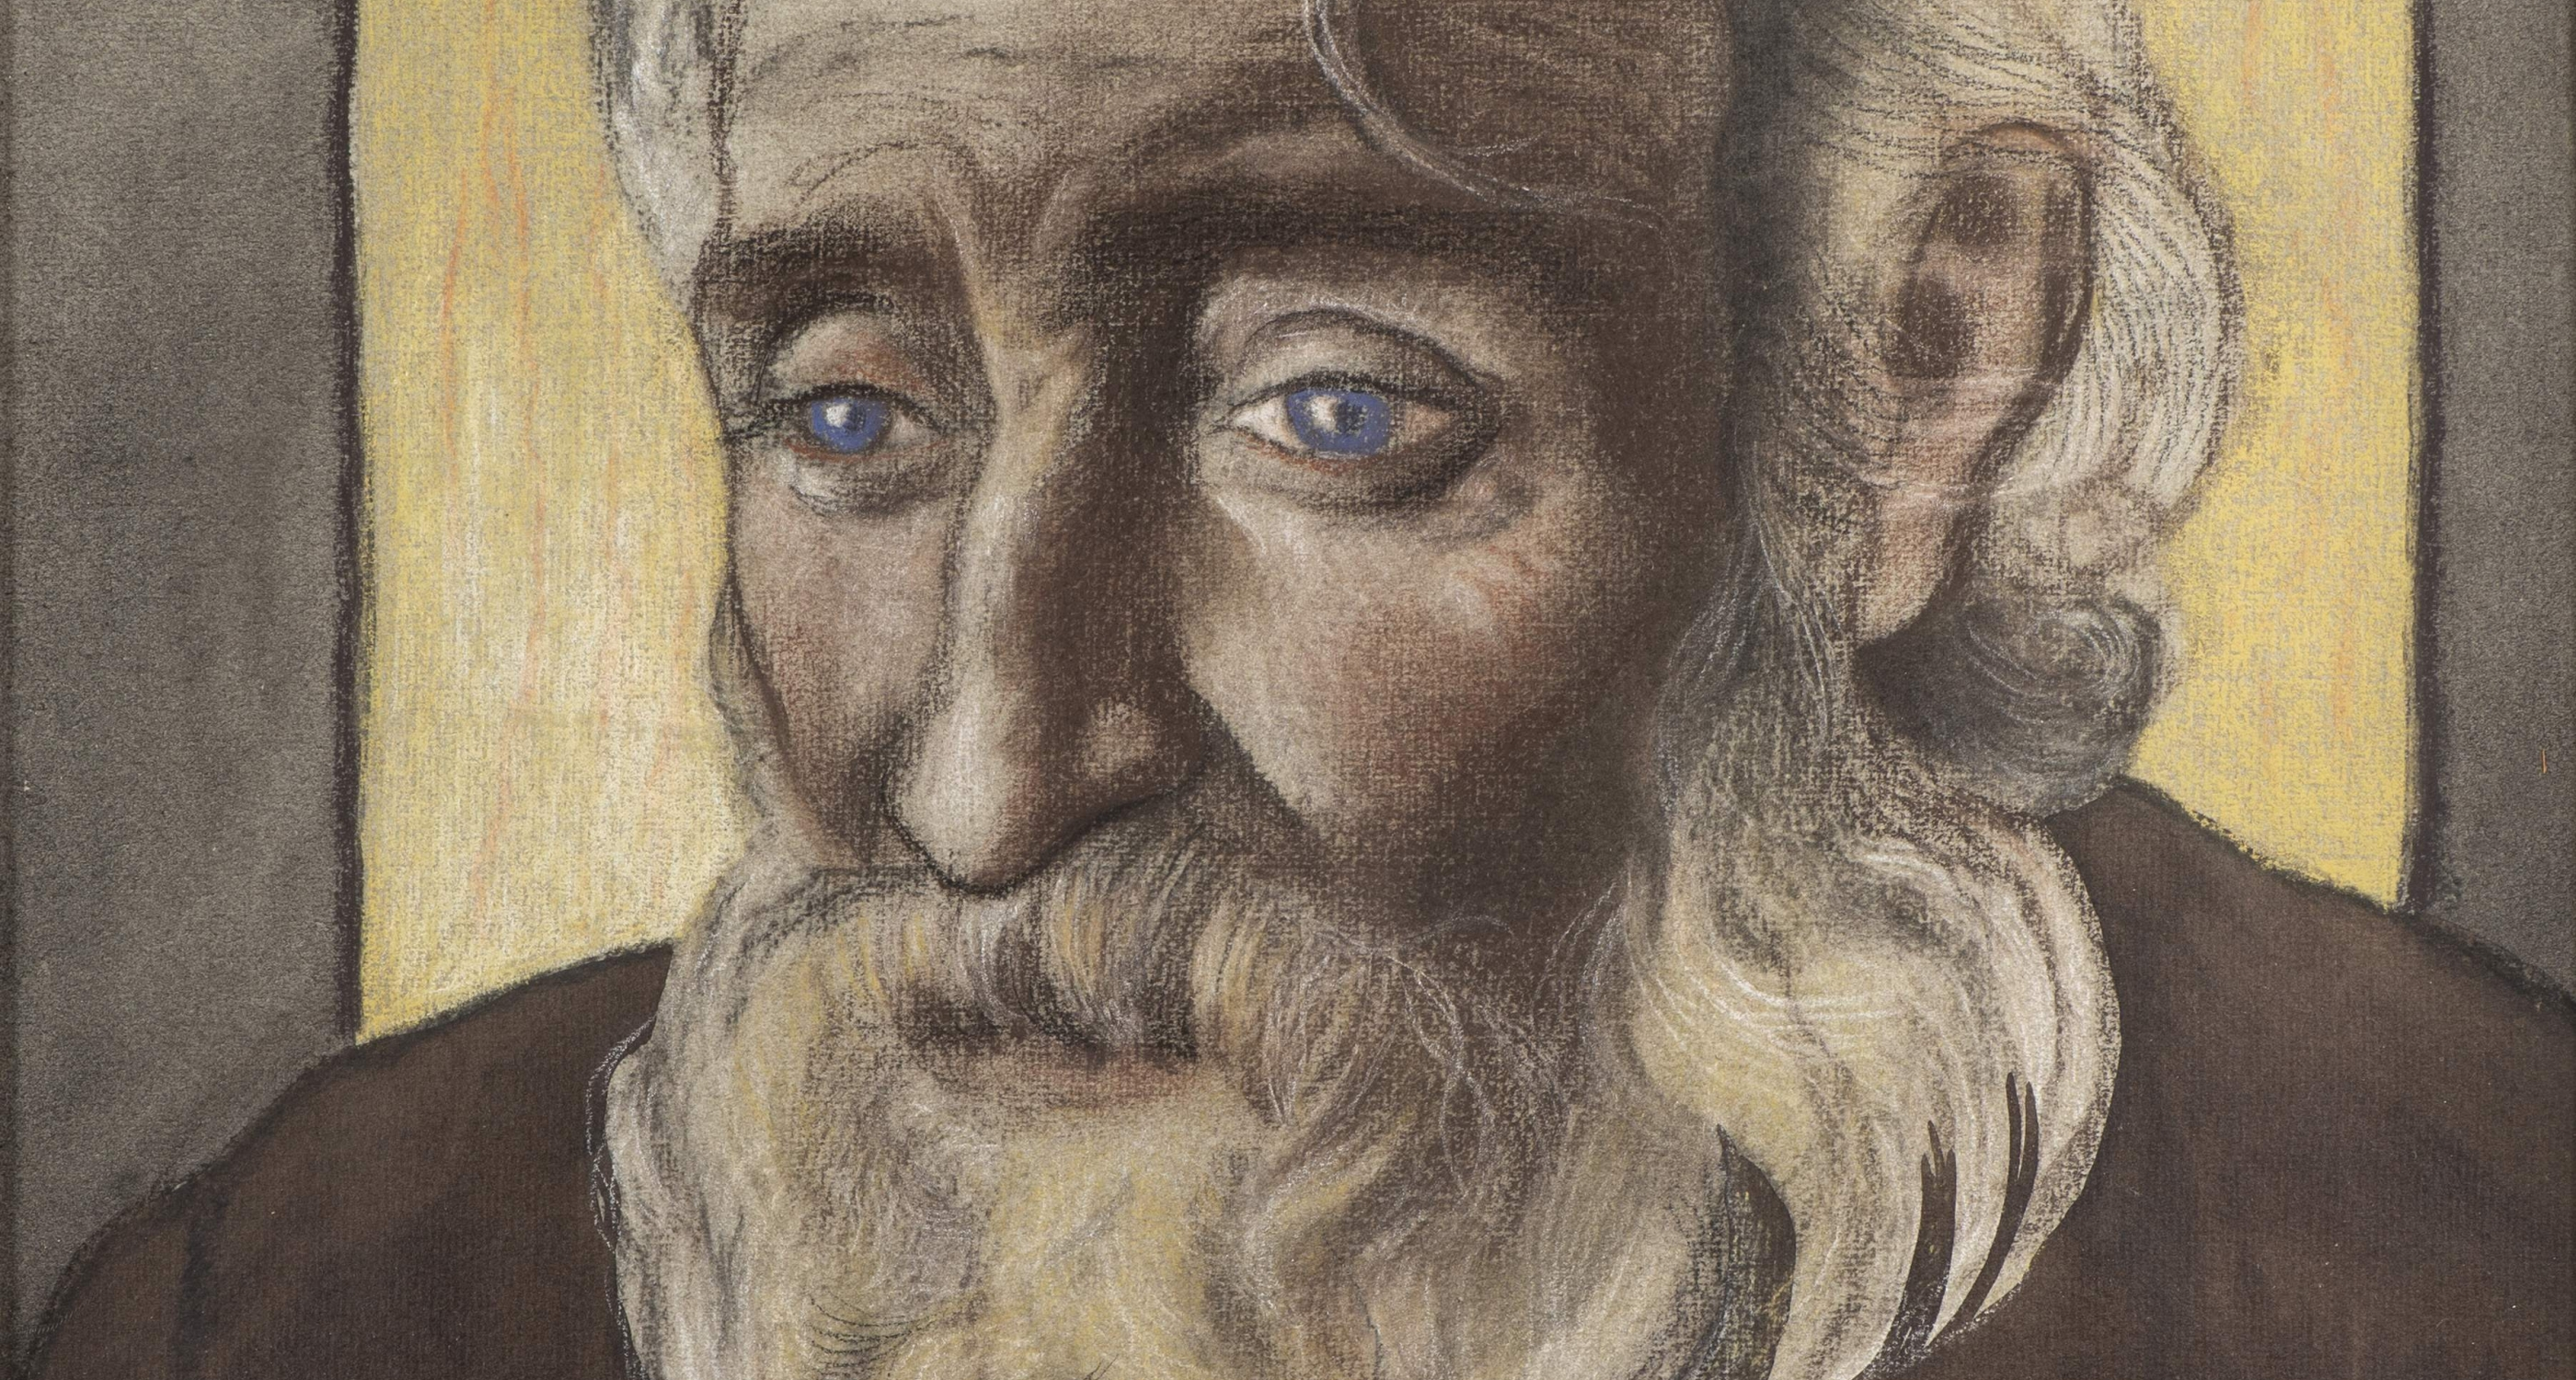 HIGHLIGHT: CHARLES-CLOS OLSOMMER: PORTRAIT D'UN VALAISAN